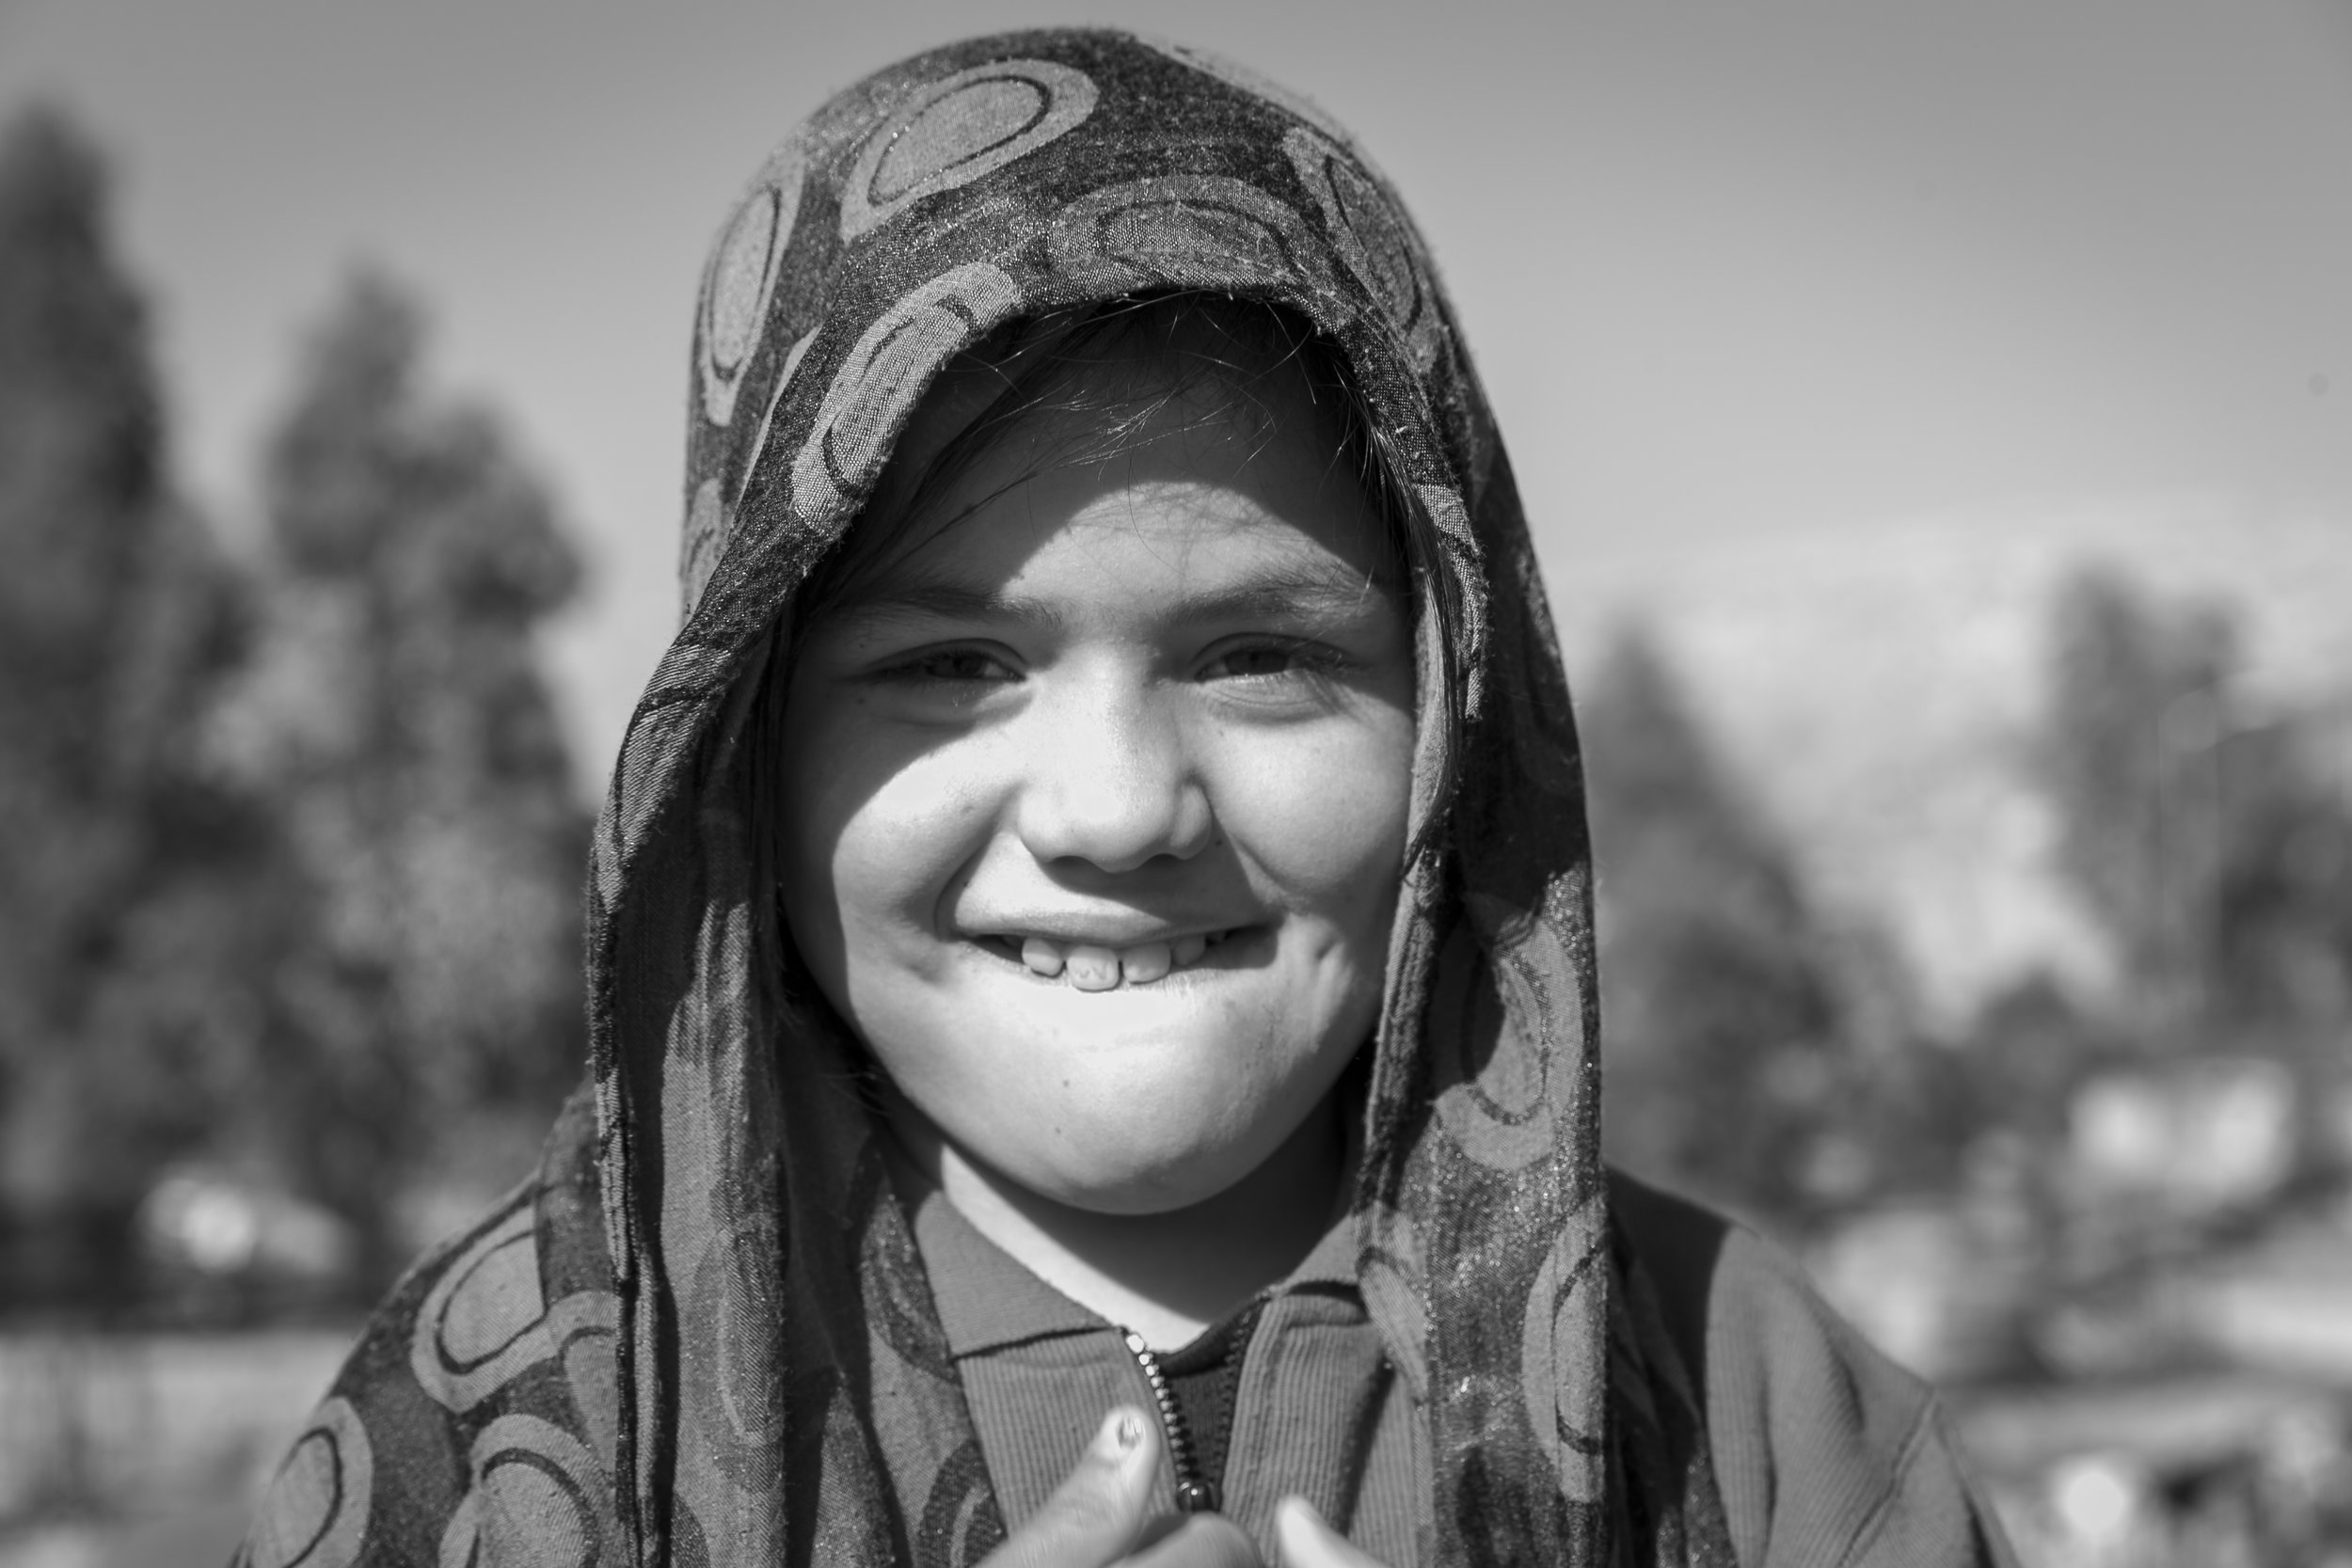 20141204_Refugees_GH_0181.jpg